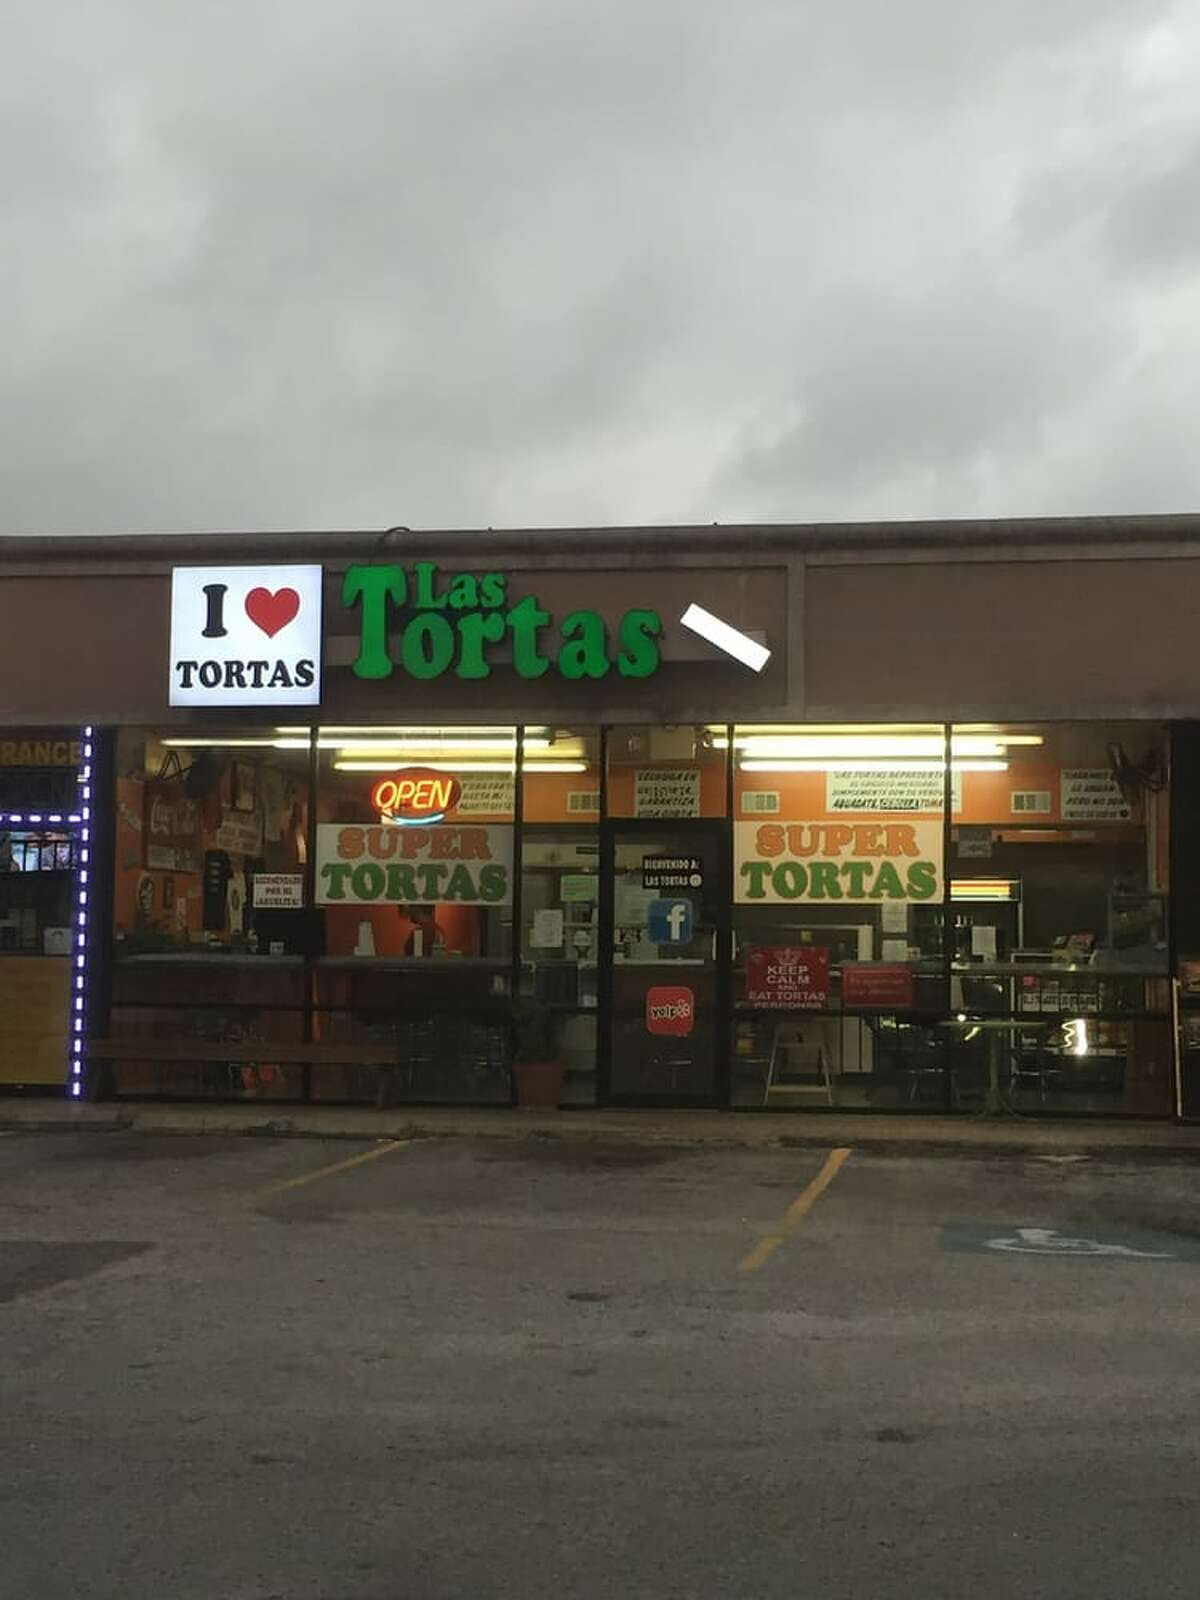 Place name: Las Tortas PerronasYelp ranking: 89Location: Photo: Joshua L. /Yelp